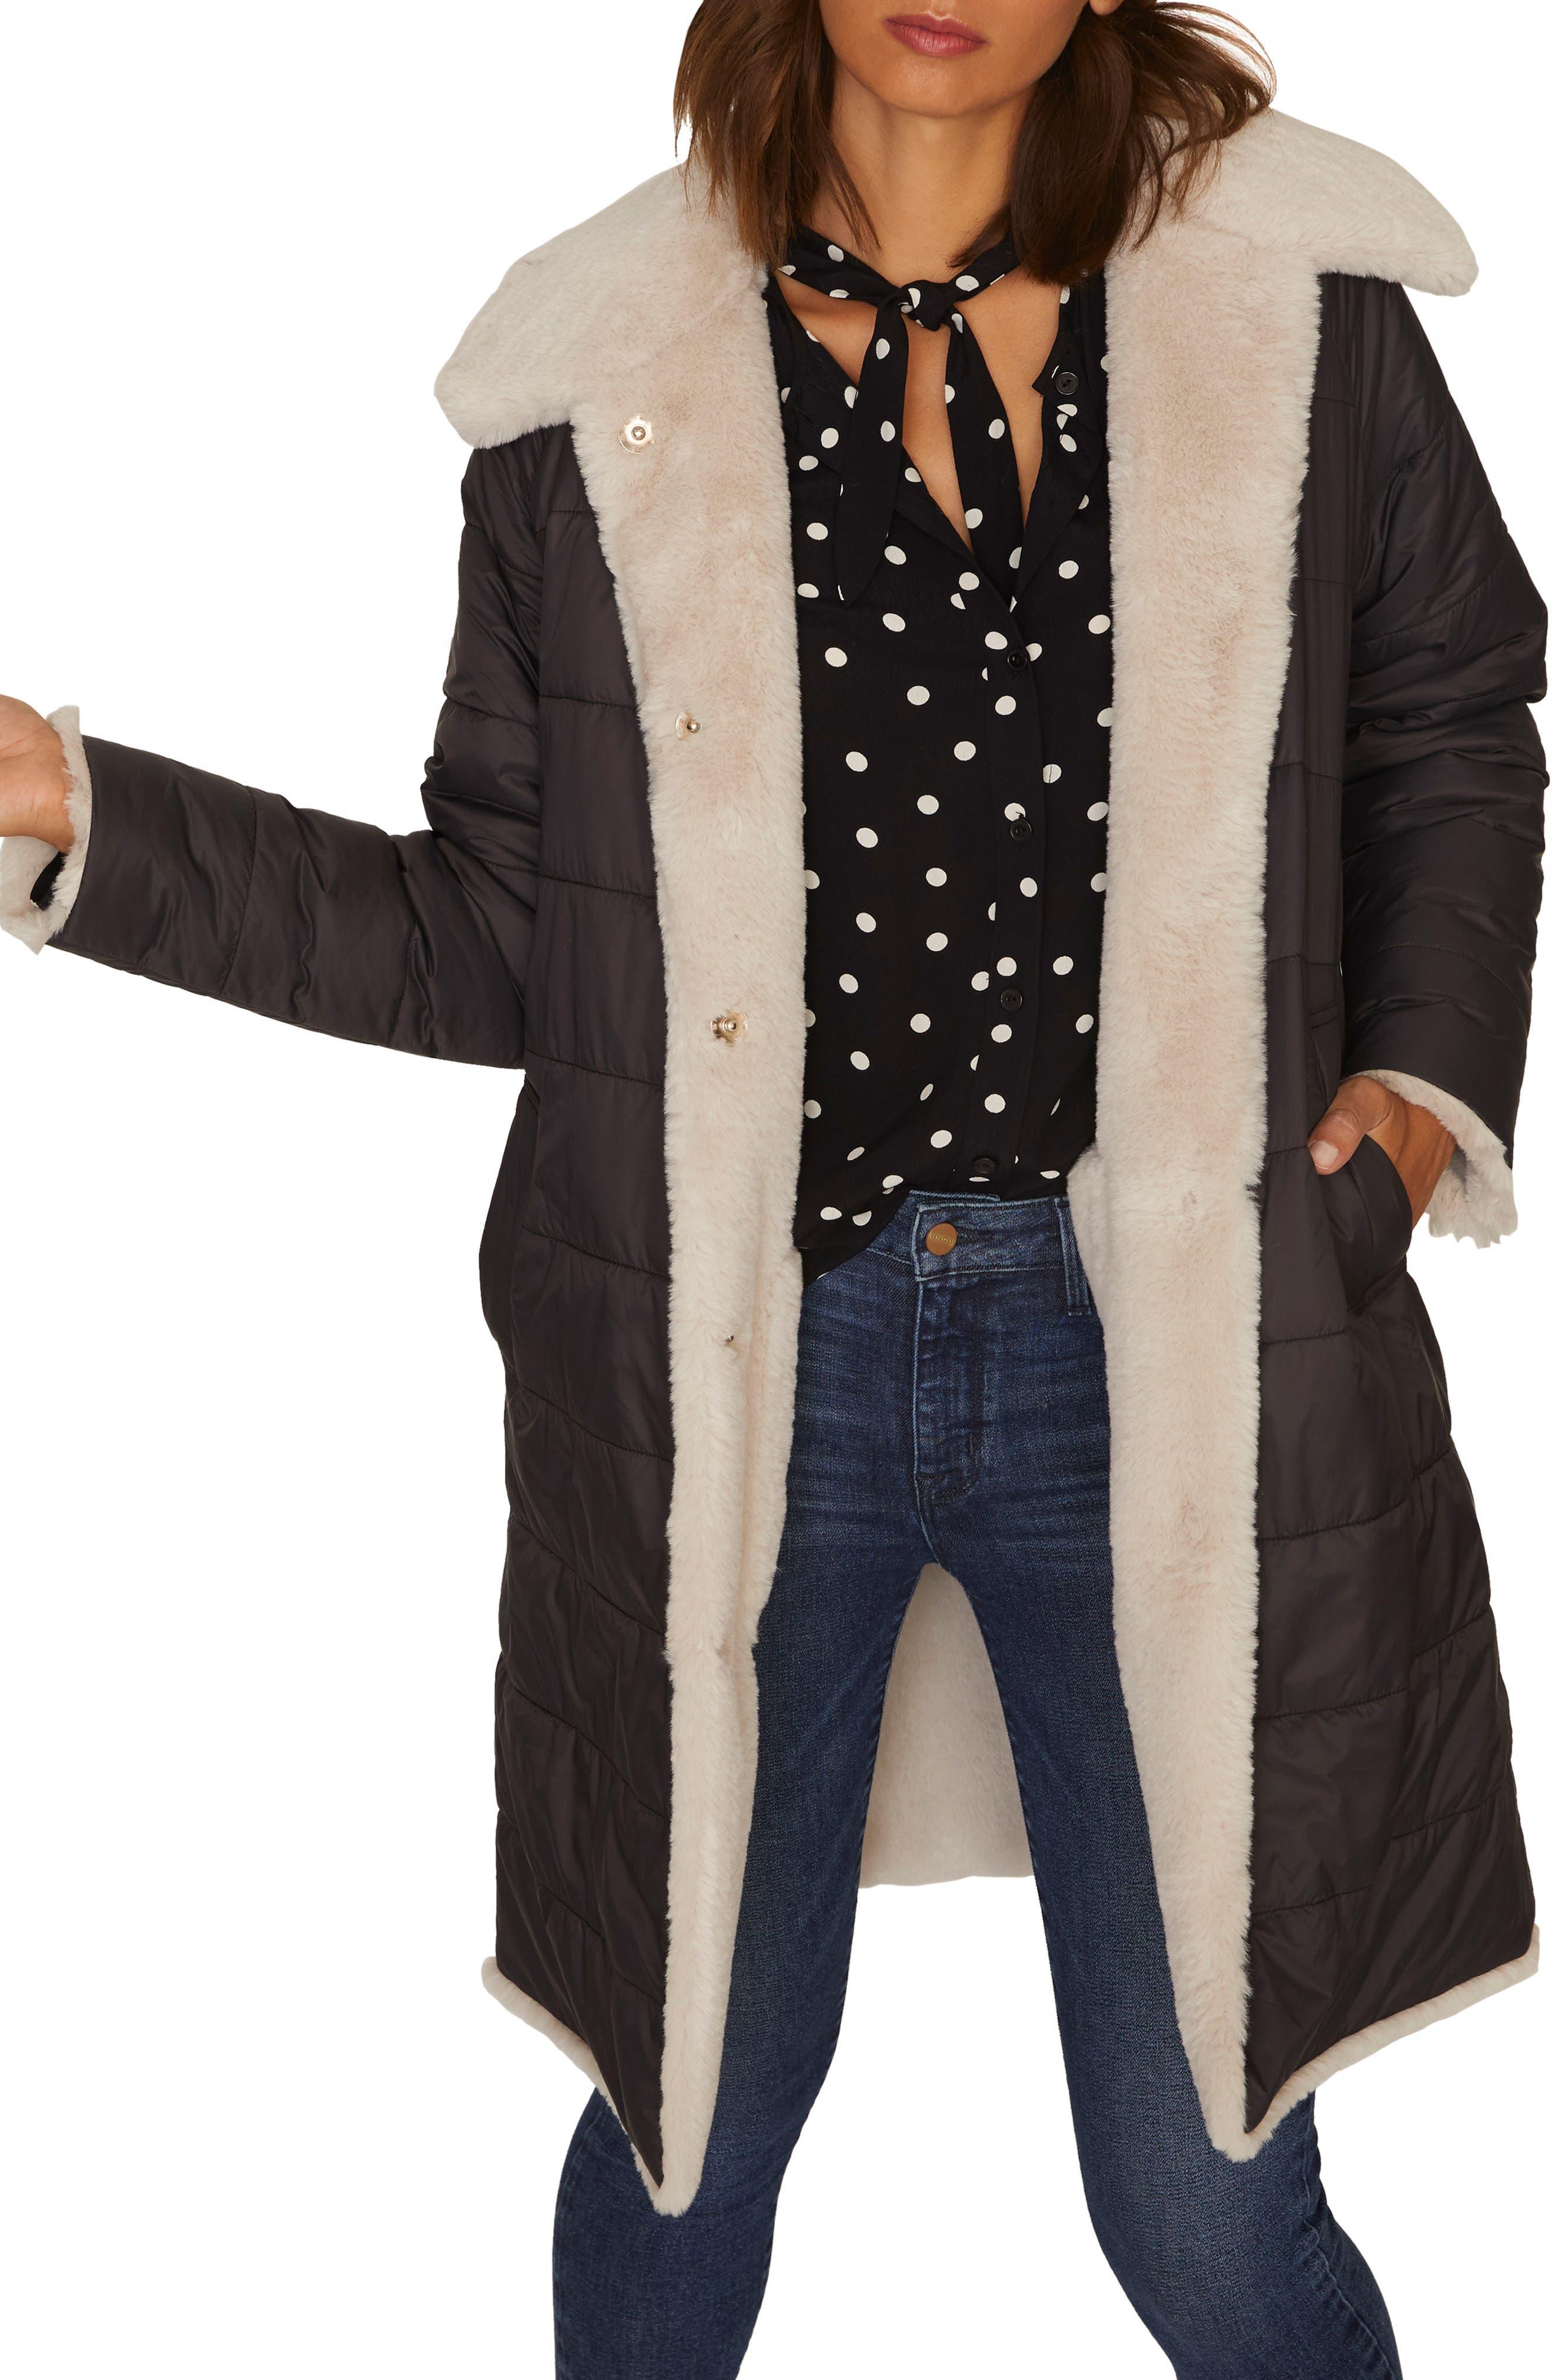 2 Be Real Reversible Puffa Faux Shearling Coat,                             Main thumbnail 1, color,                             001